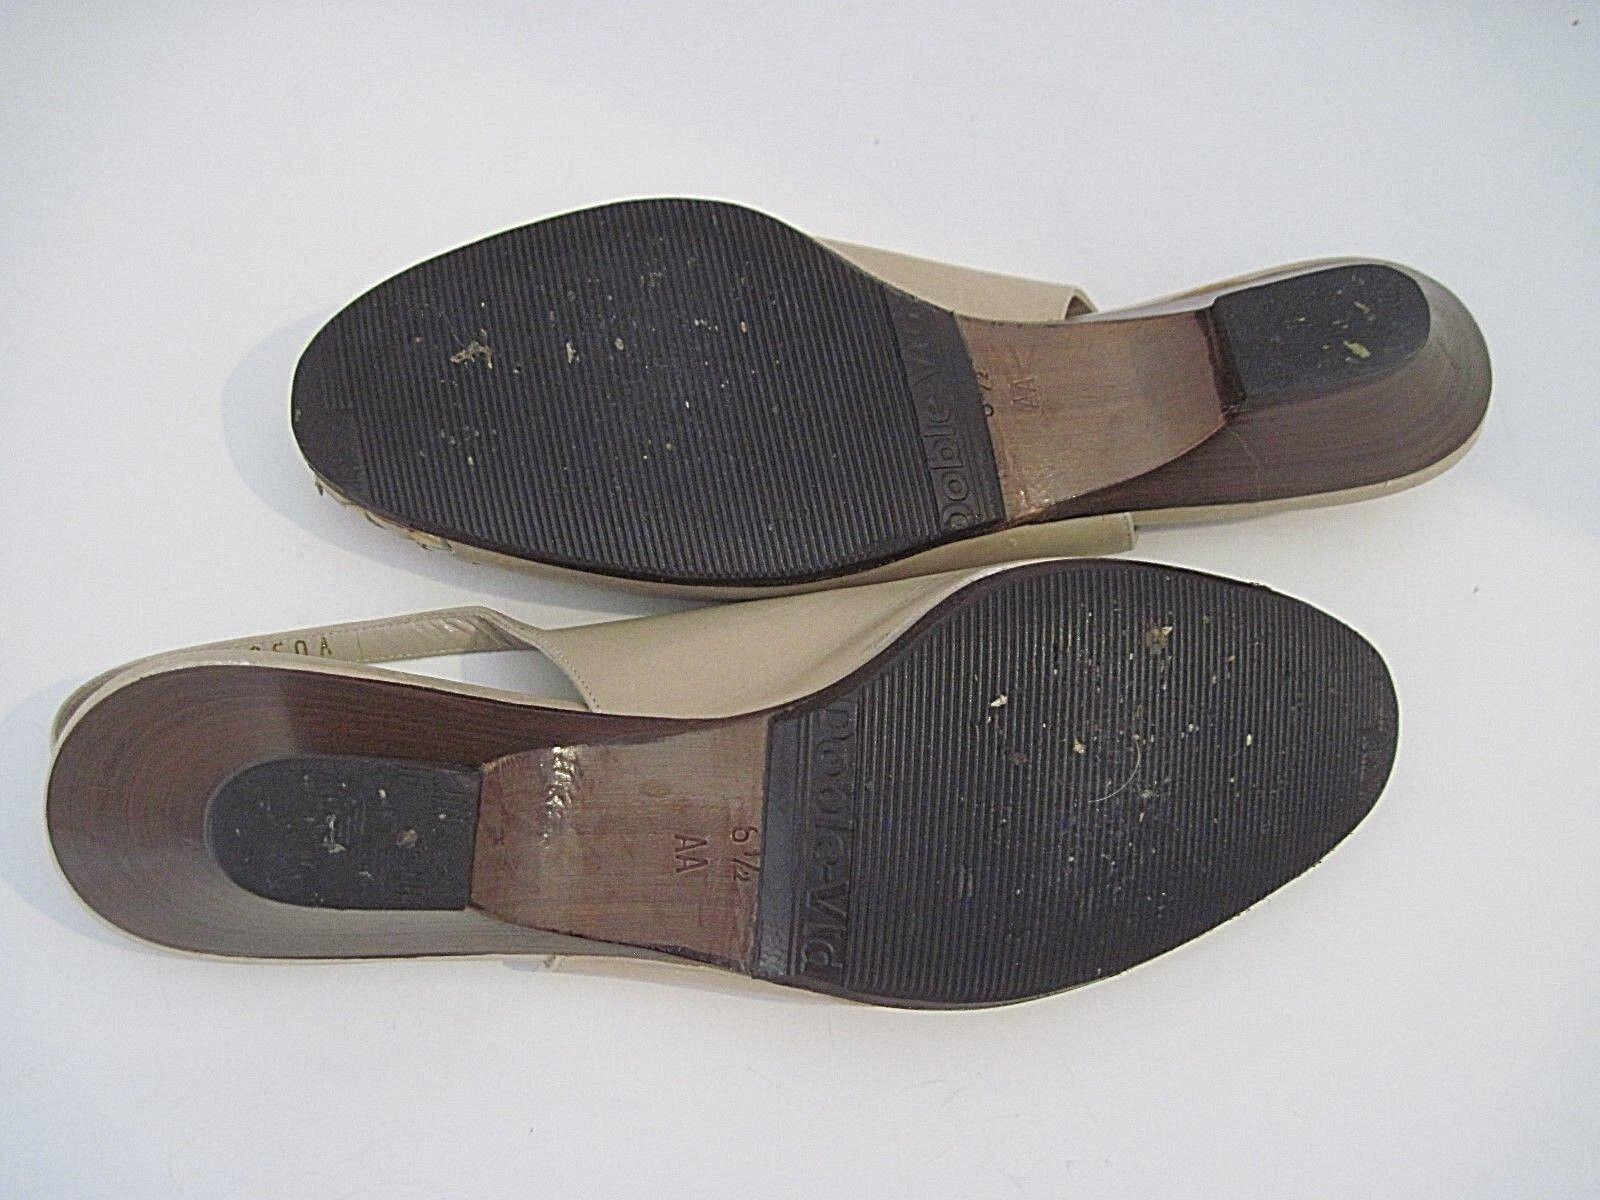 BRUNO MAGLI Beige Leder Patent Leder Slingbacks Heels Open Toe 6 1/2 AA